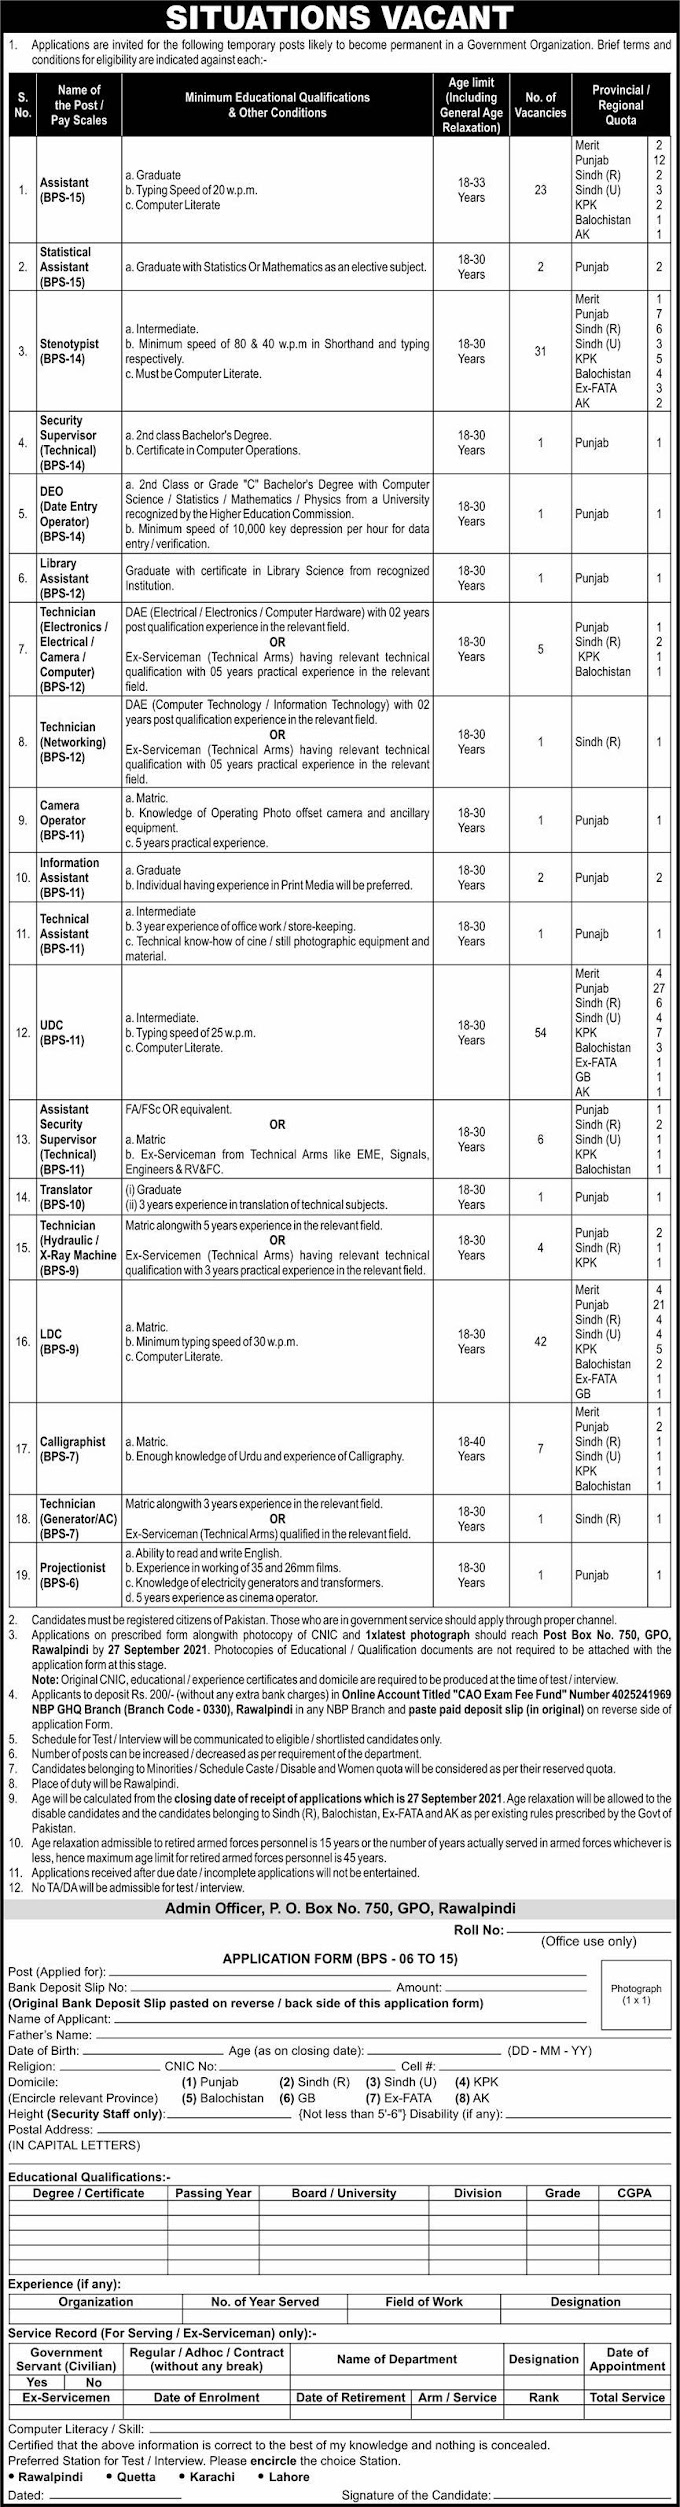 Pakistan Army PO Box No 750 GPO Rawalpindi GHQ Jobs 2021